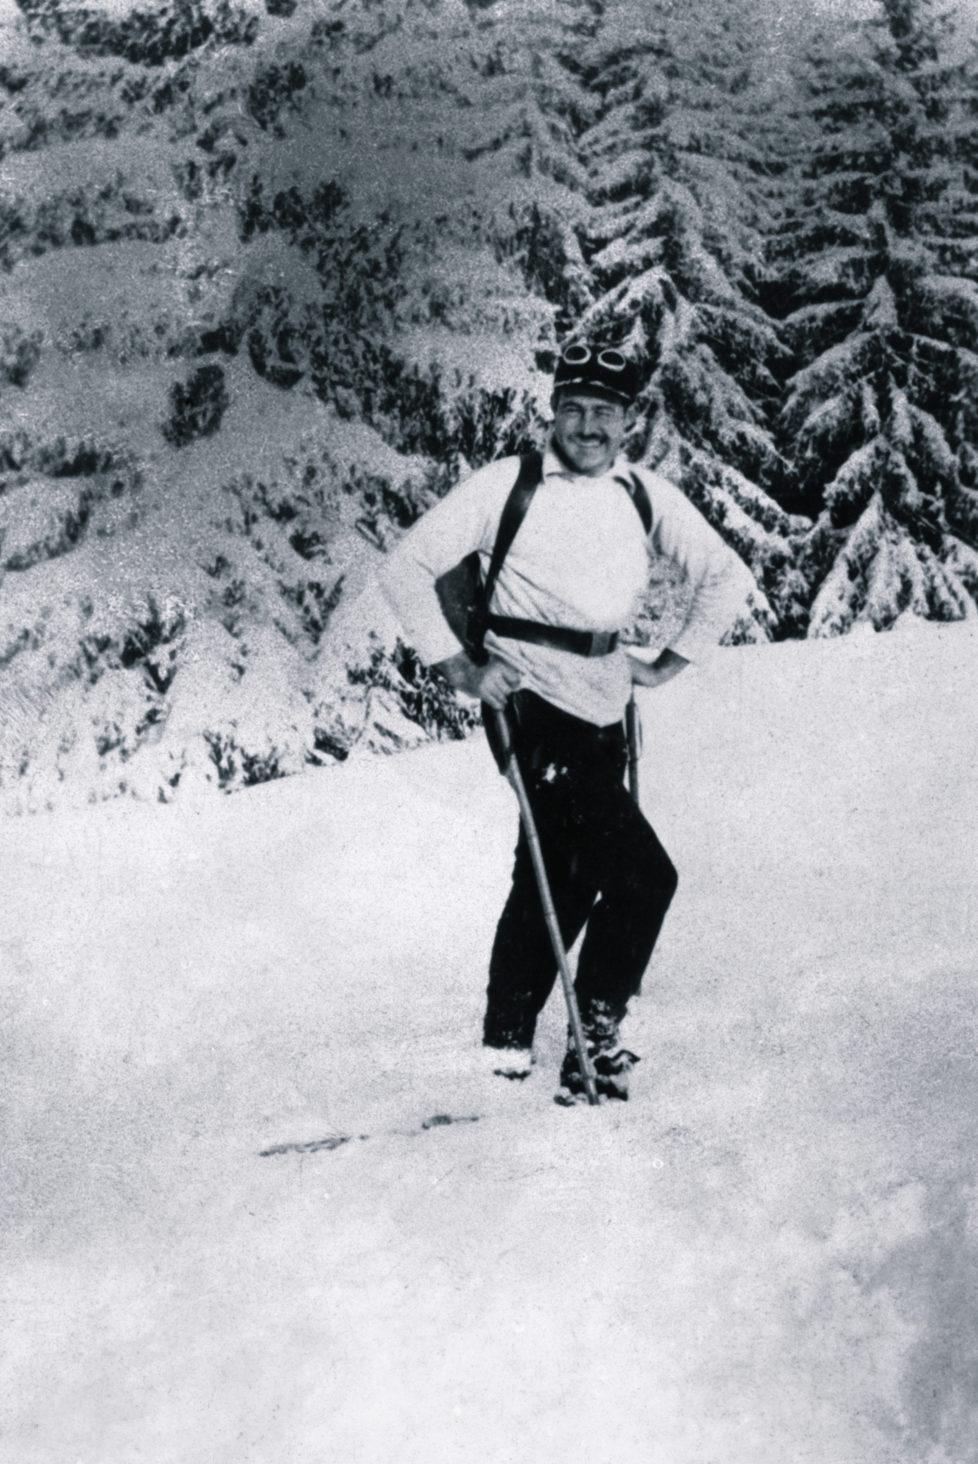 (Original Caption) Ernest Hemingway photography during at Gstaad, Switzerland.